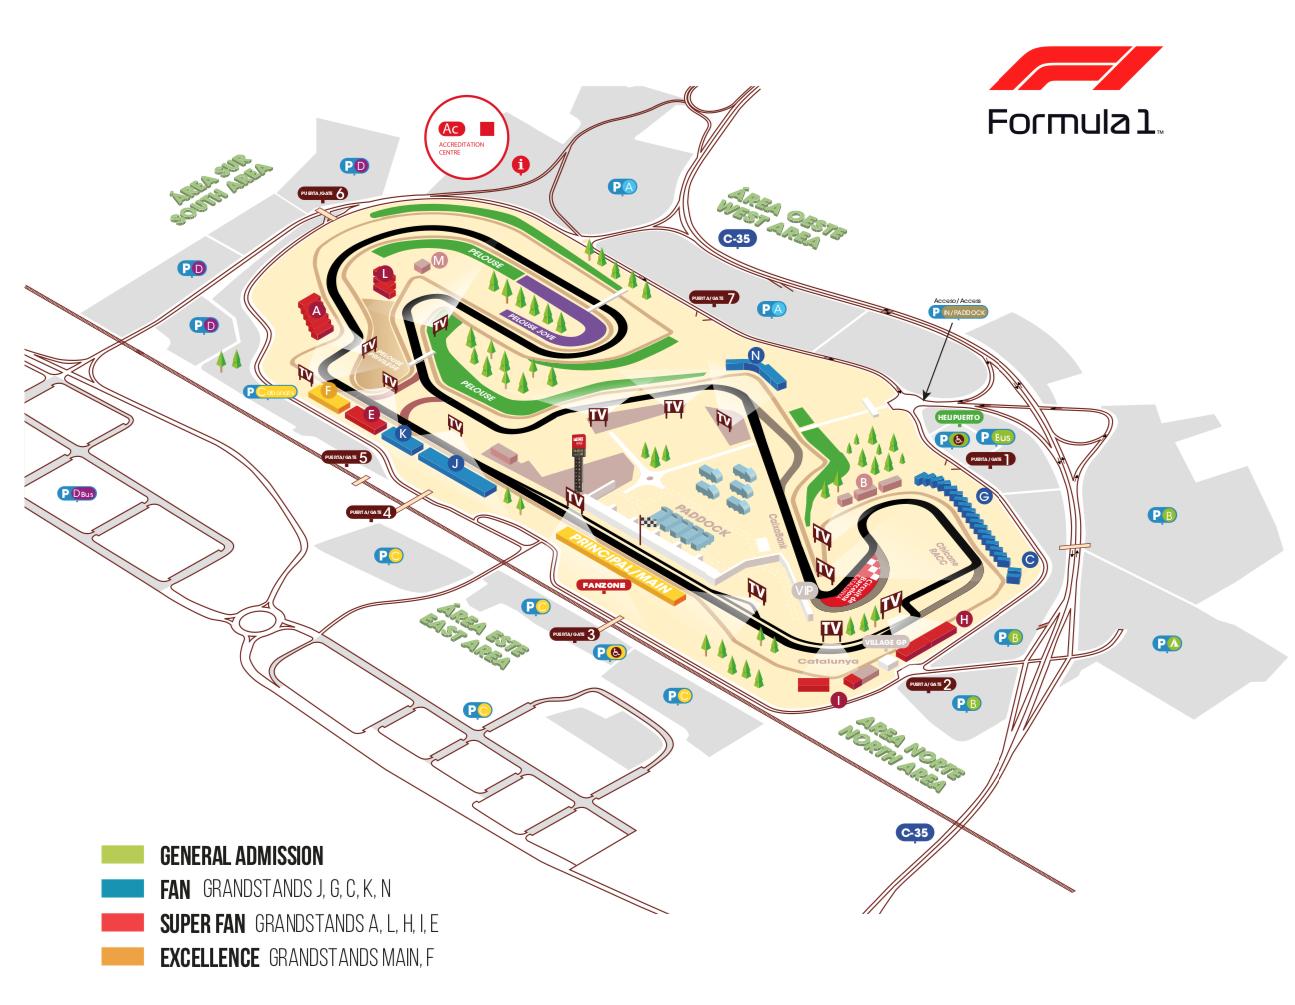 F1 Barcelona banskisss 2020